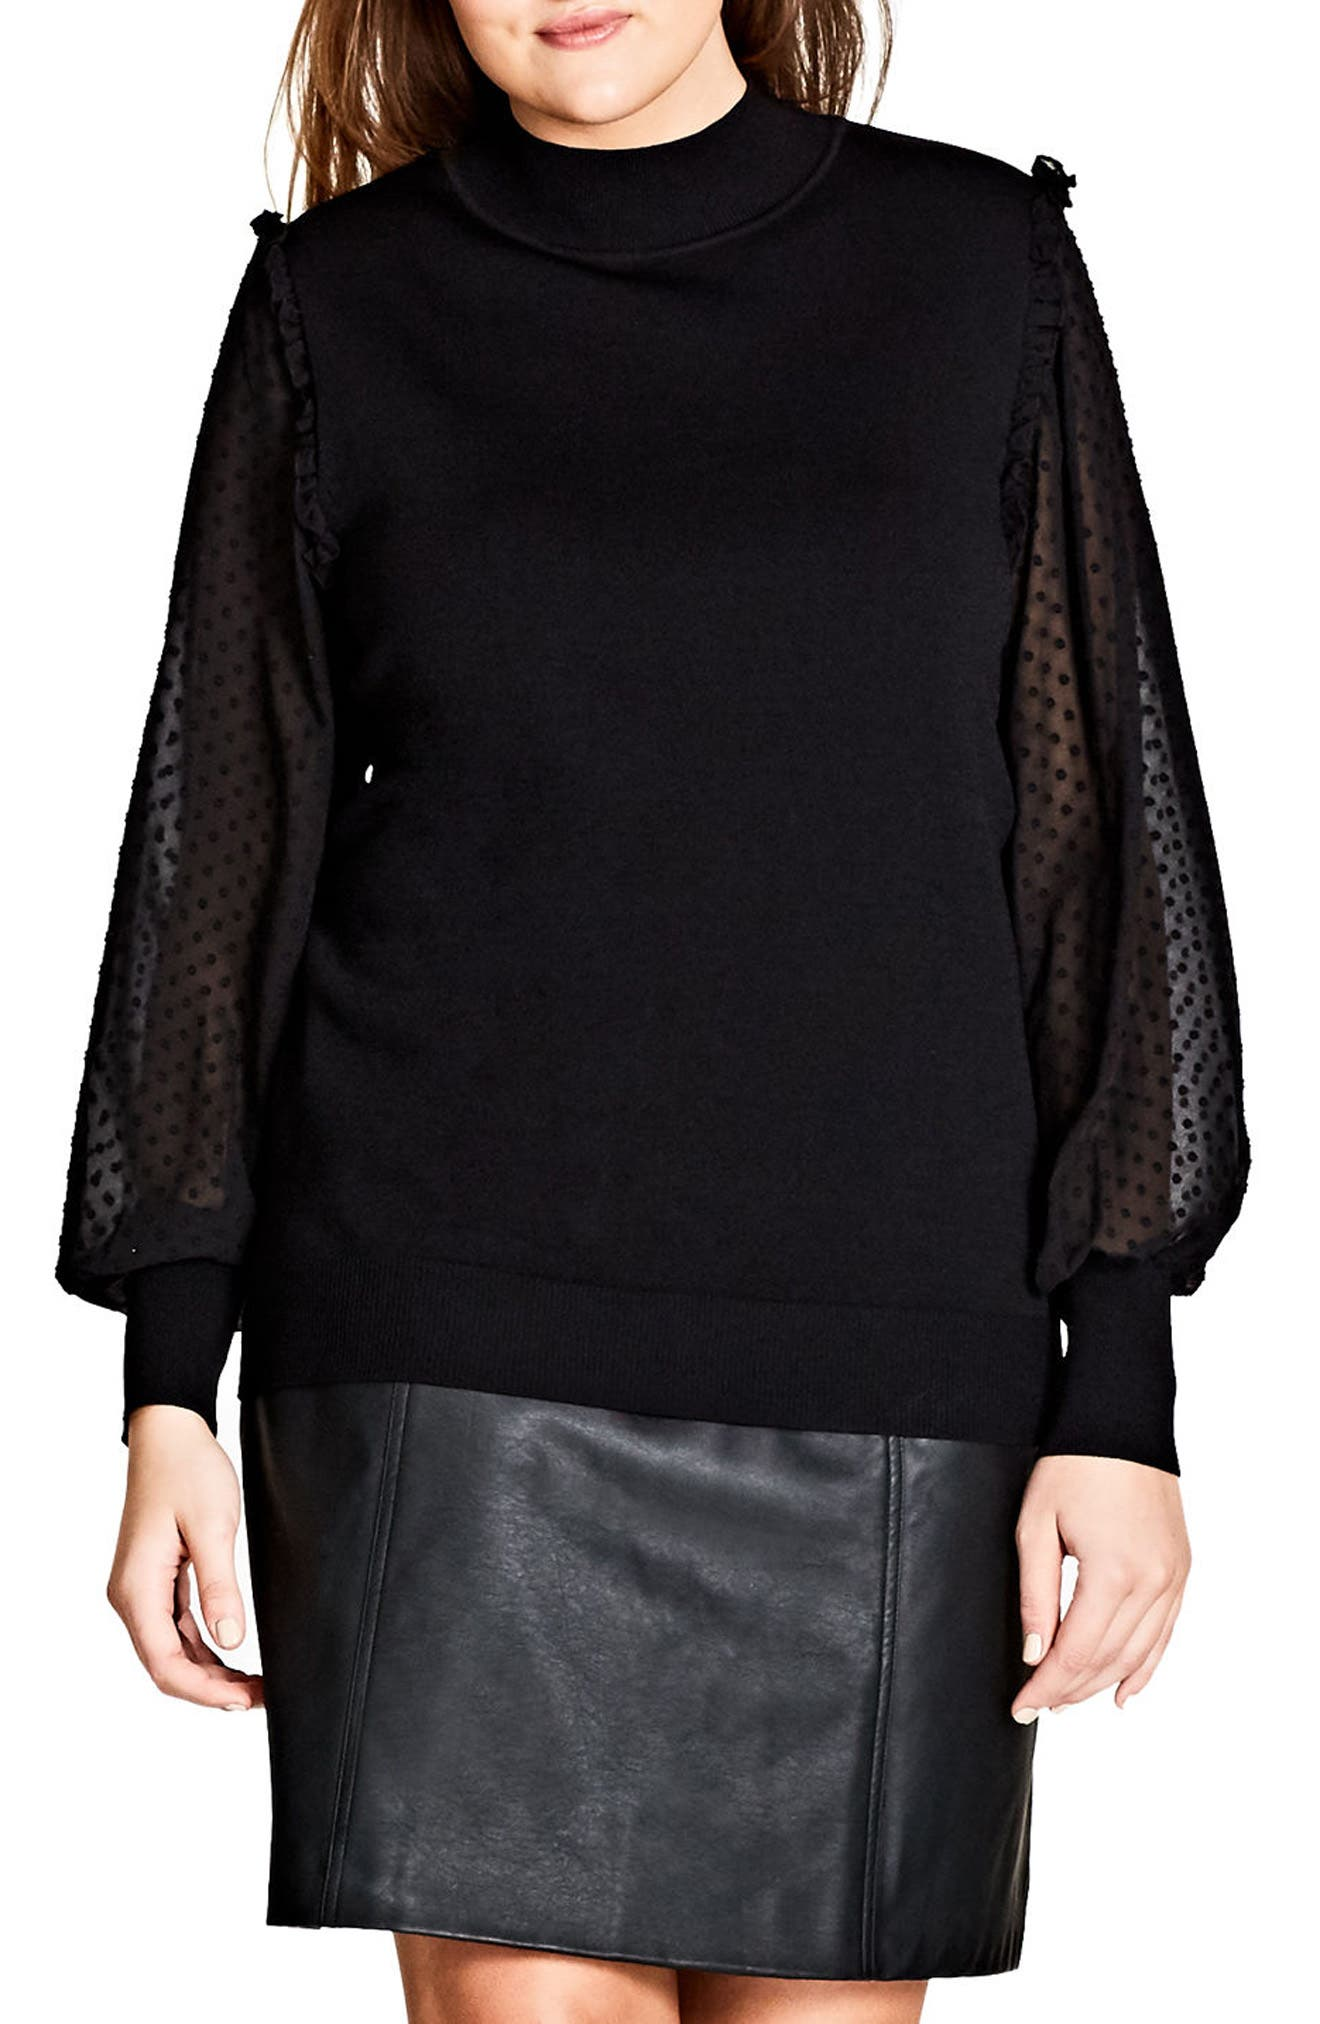 Swiss Dot Sleeve Sweater,                         Main,                         color, Black